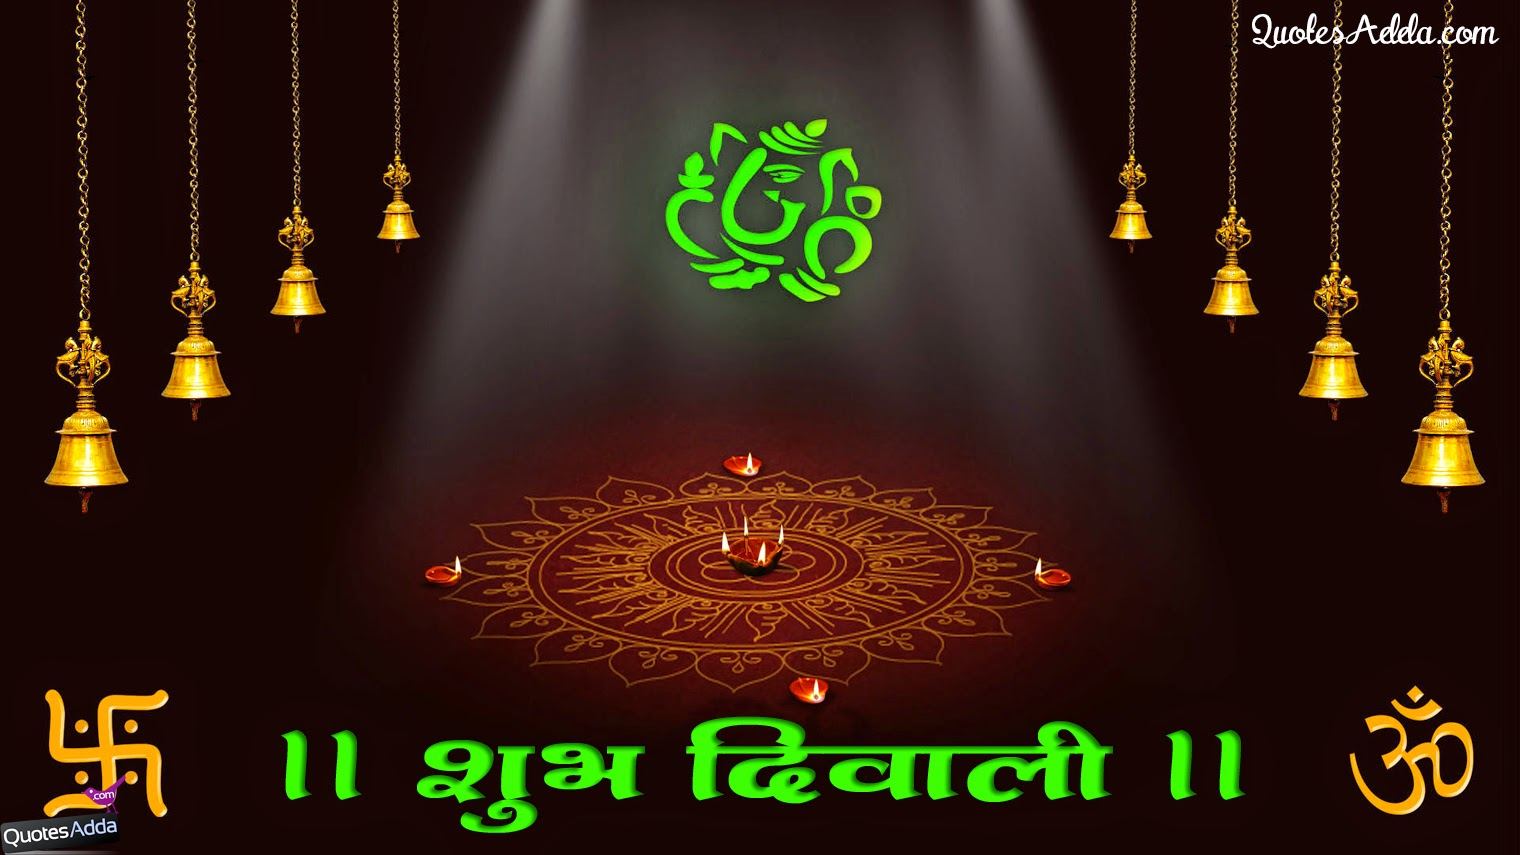 Happy diwali funny video download lieurace happy diwali funny video download m4hsunfo